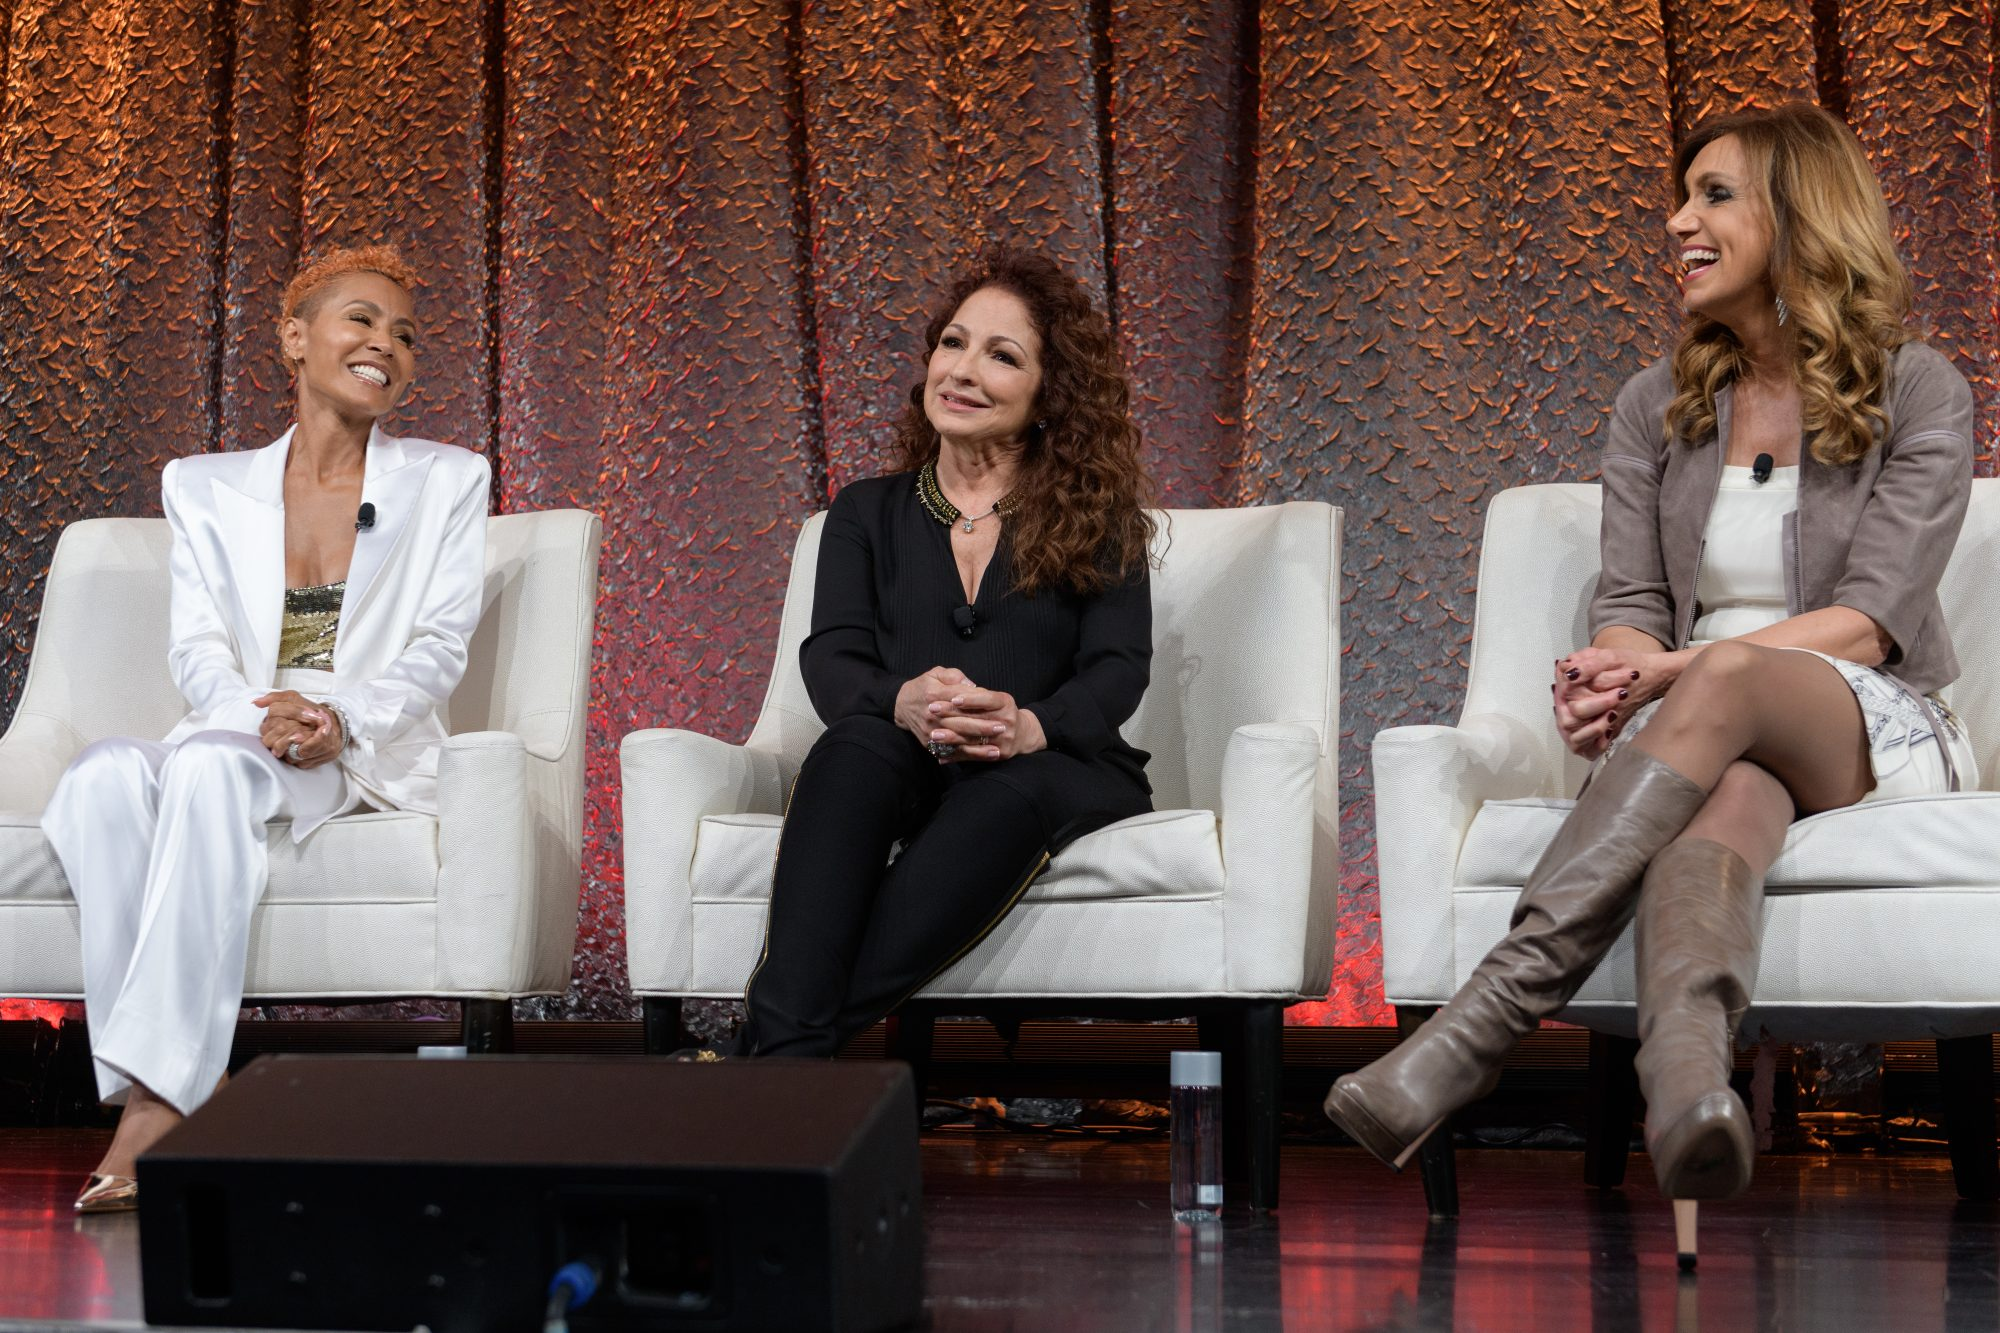 NATPE Miami 2020 - Facebook with Gloria, Emily and Lili Estefan - Jada Pinkett Smith